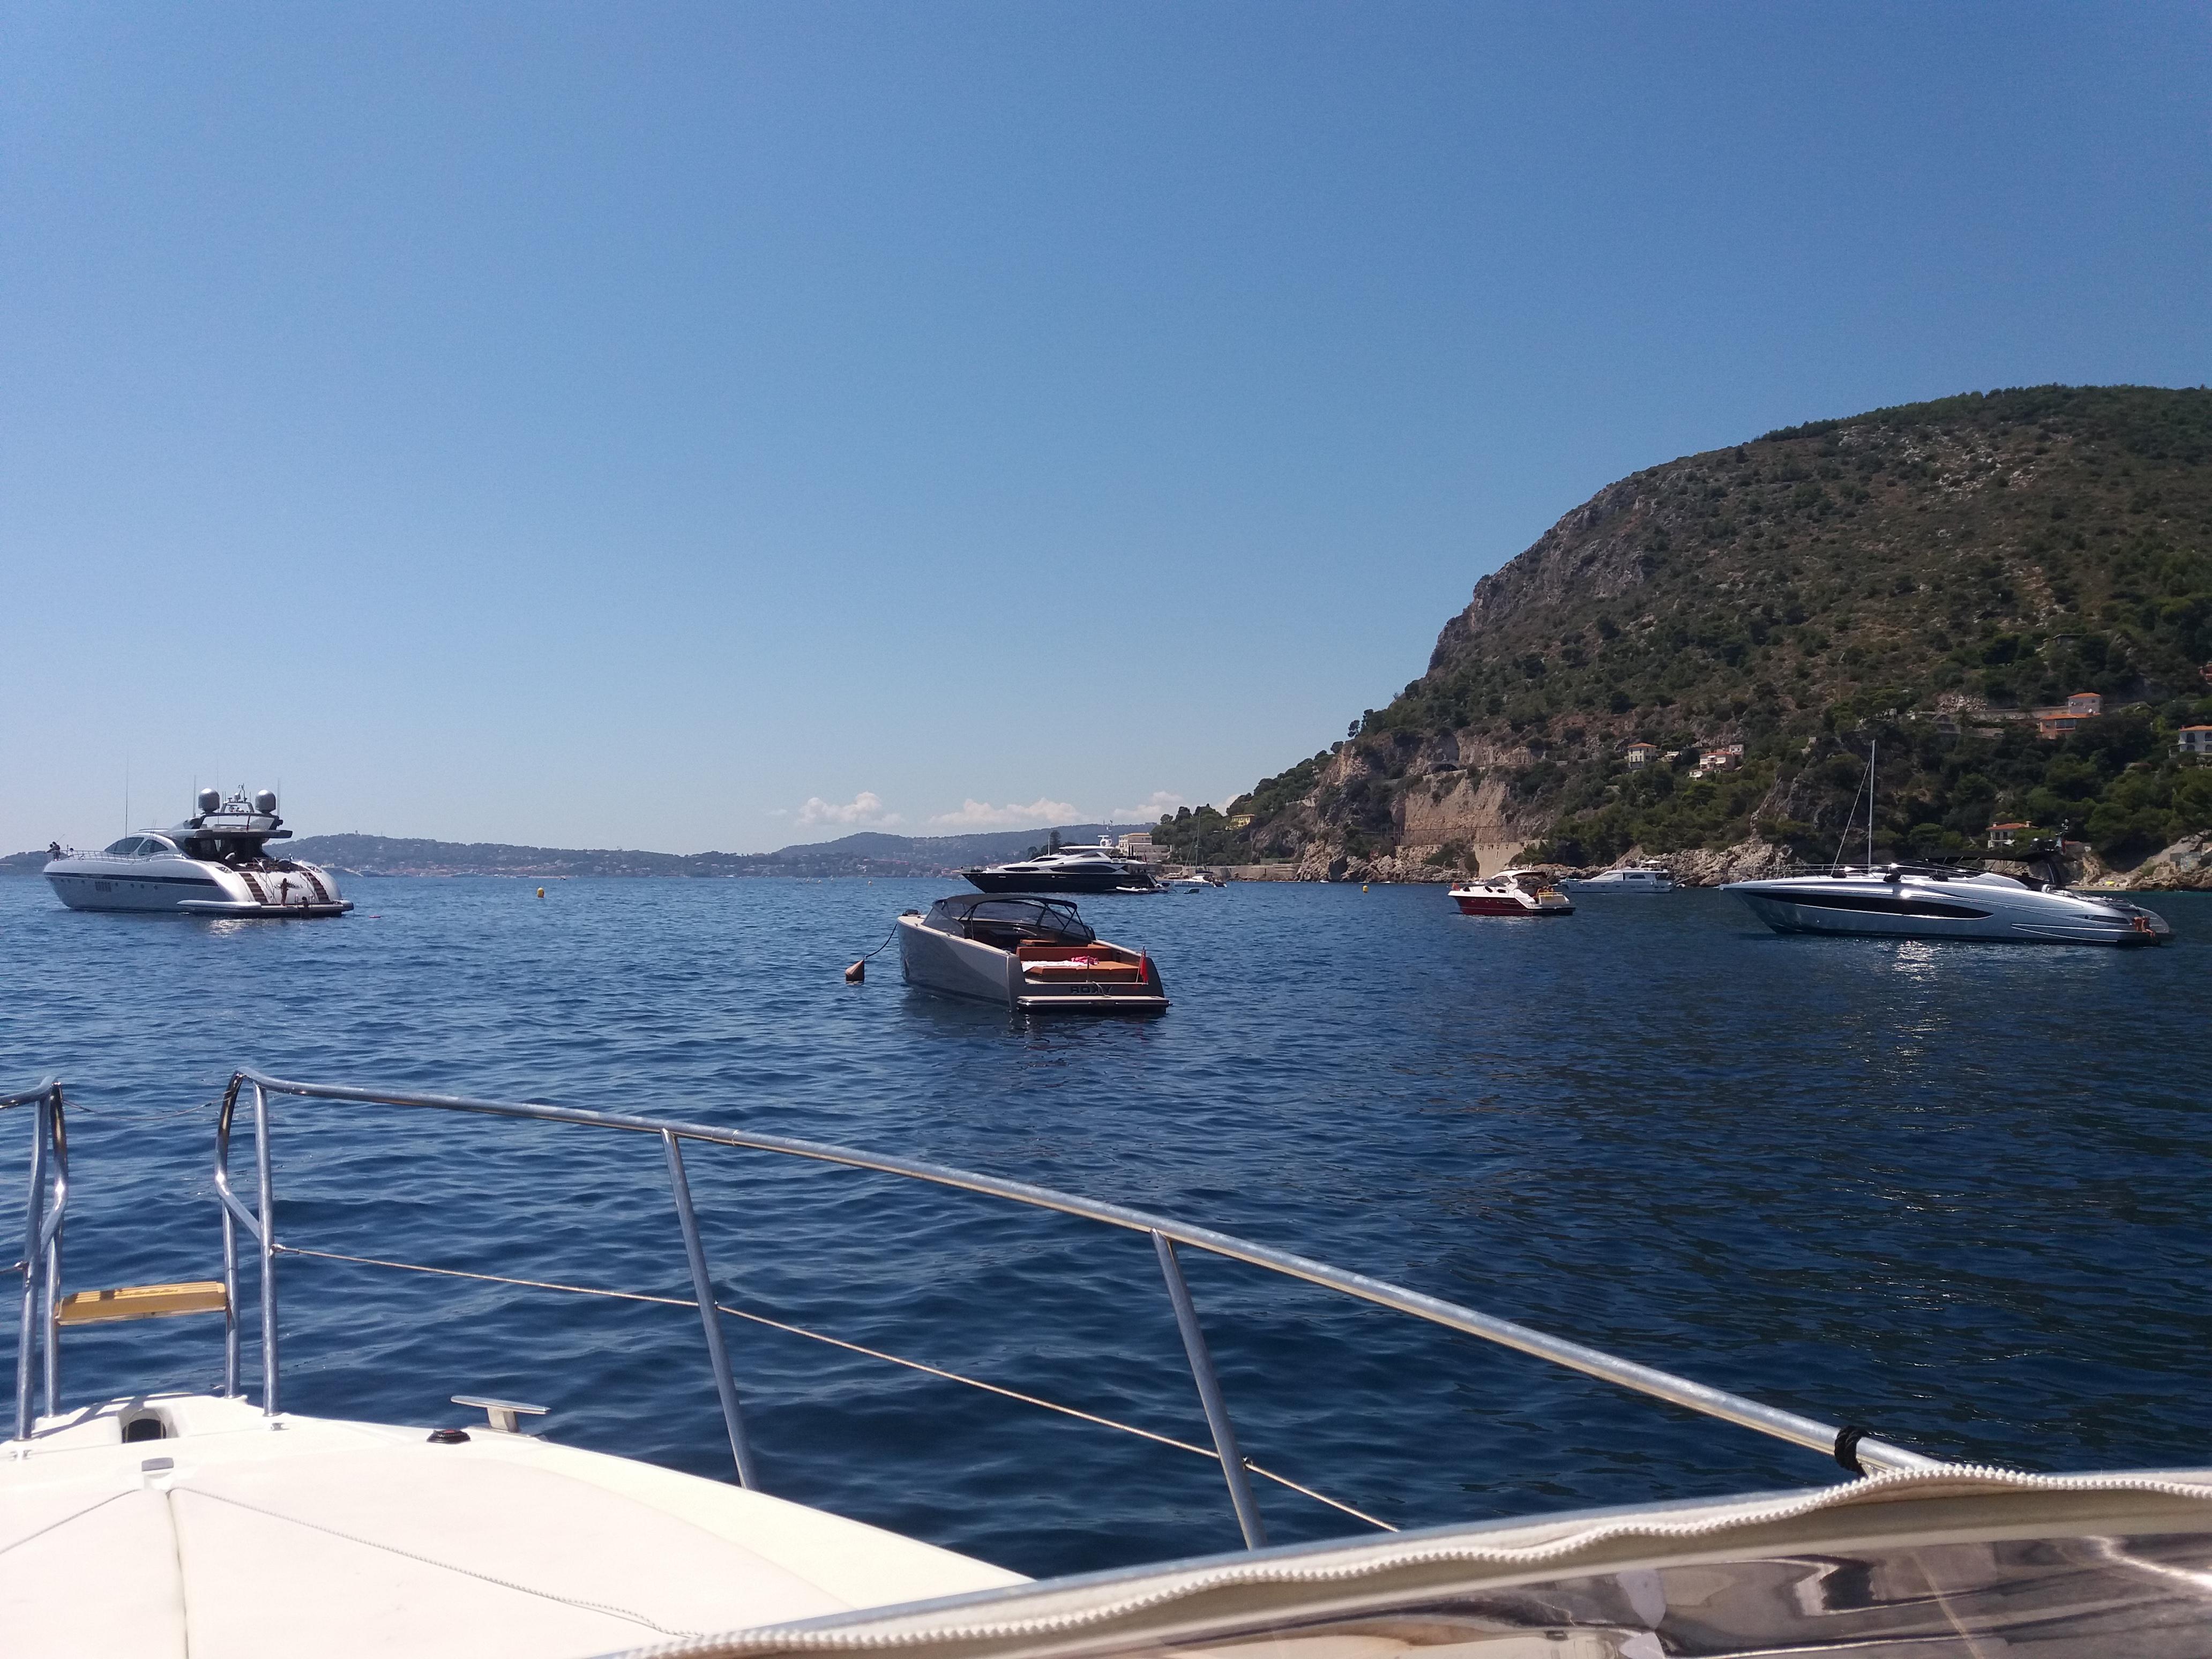 Riviera_Yacht_Charter_Costa_Azzurra_Cap_D'Ail_3